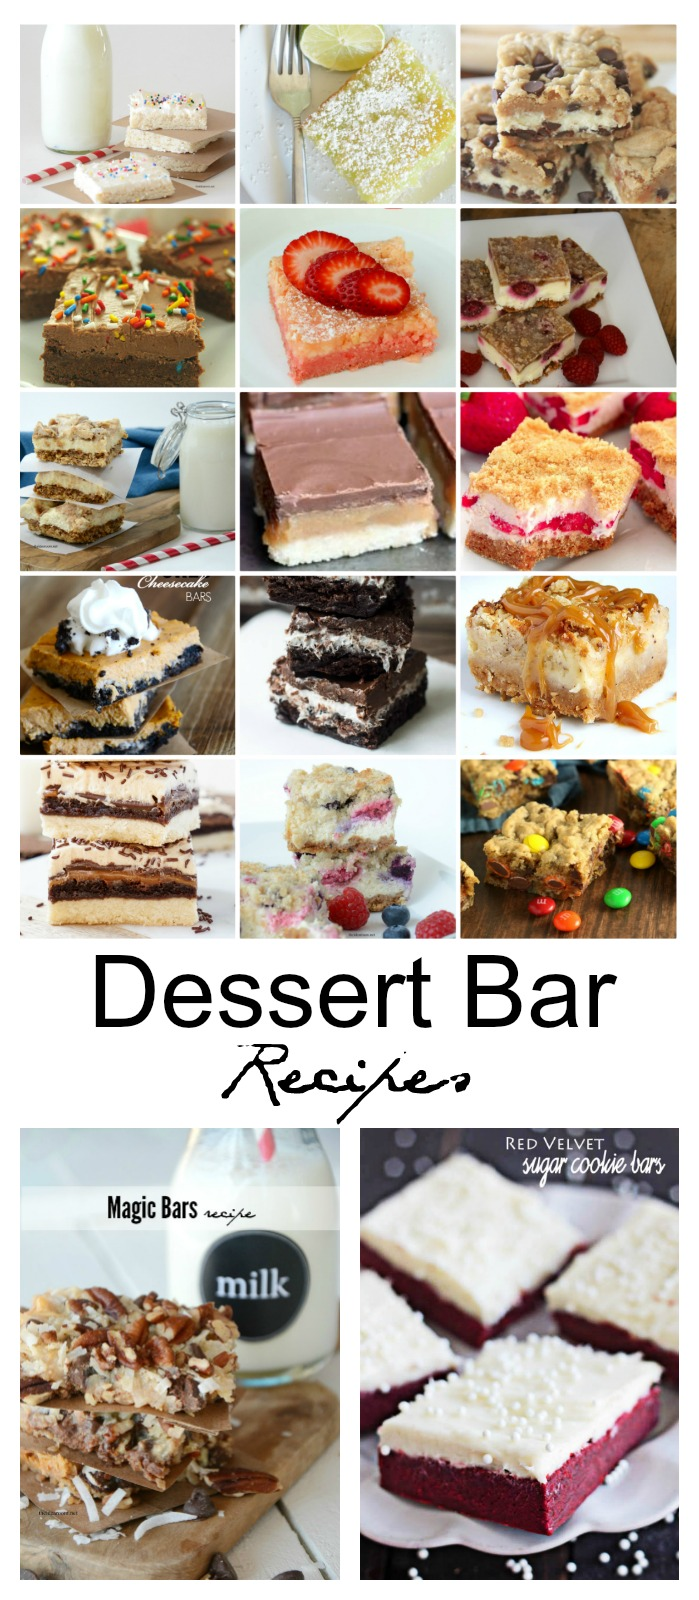 Dessert-Bar-Recipes-Ideas